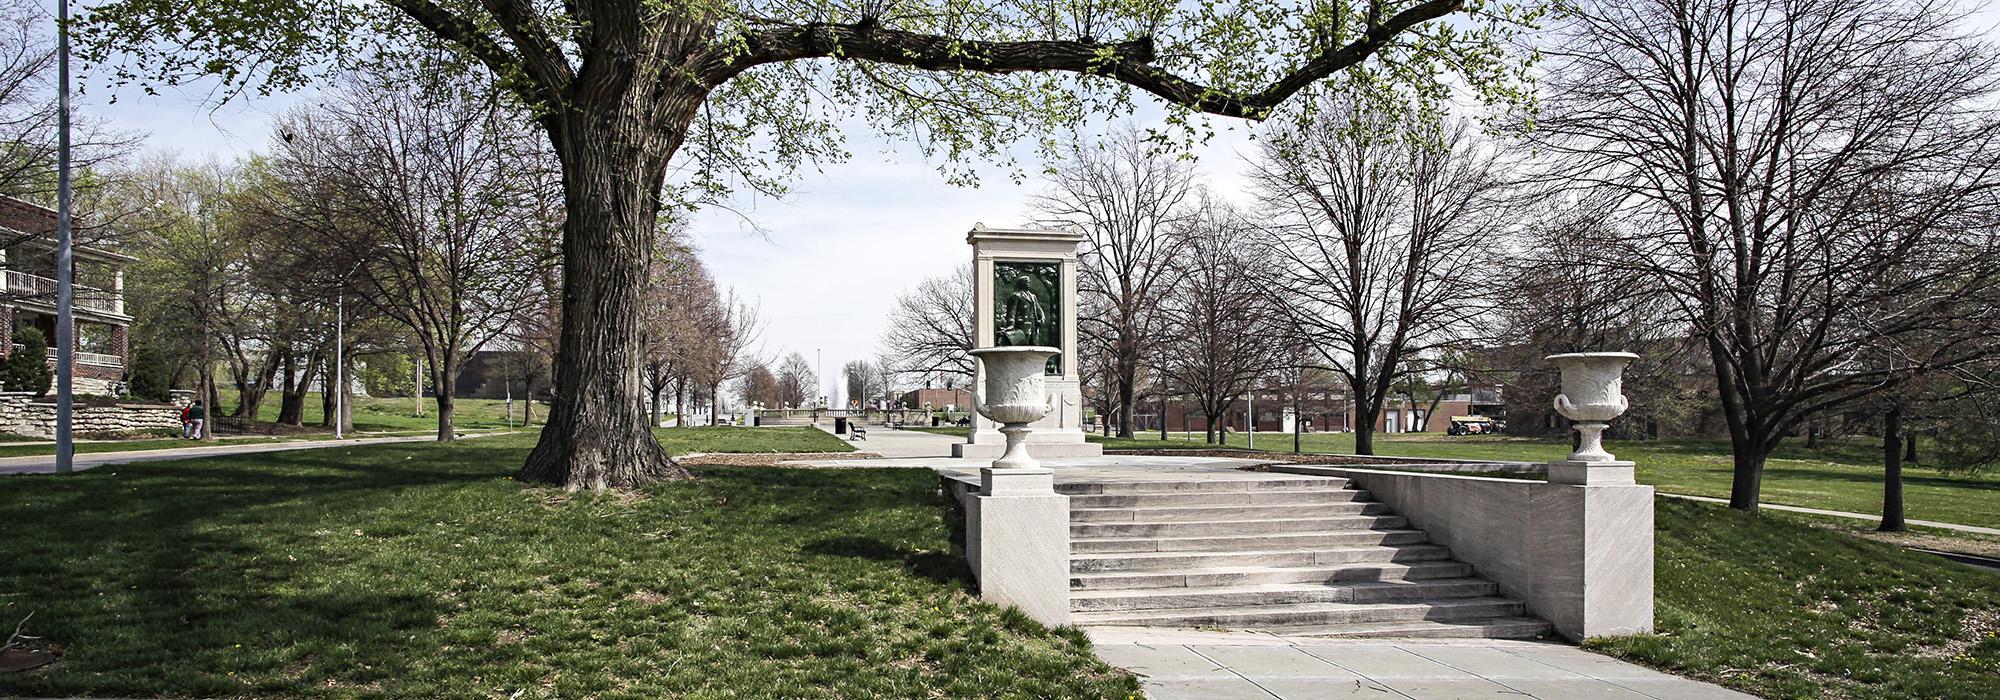 MO_KansasCity_HistoricParksBlvds_hero_2014_RichardWelnowski.jpg